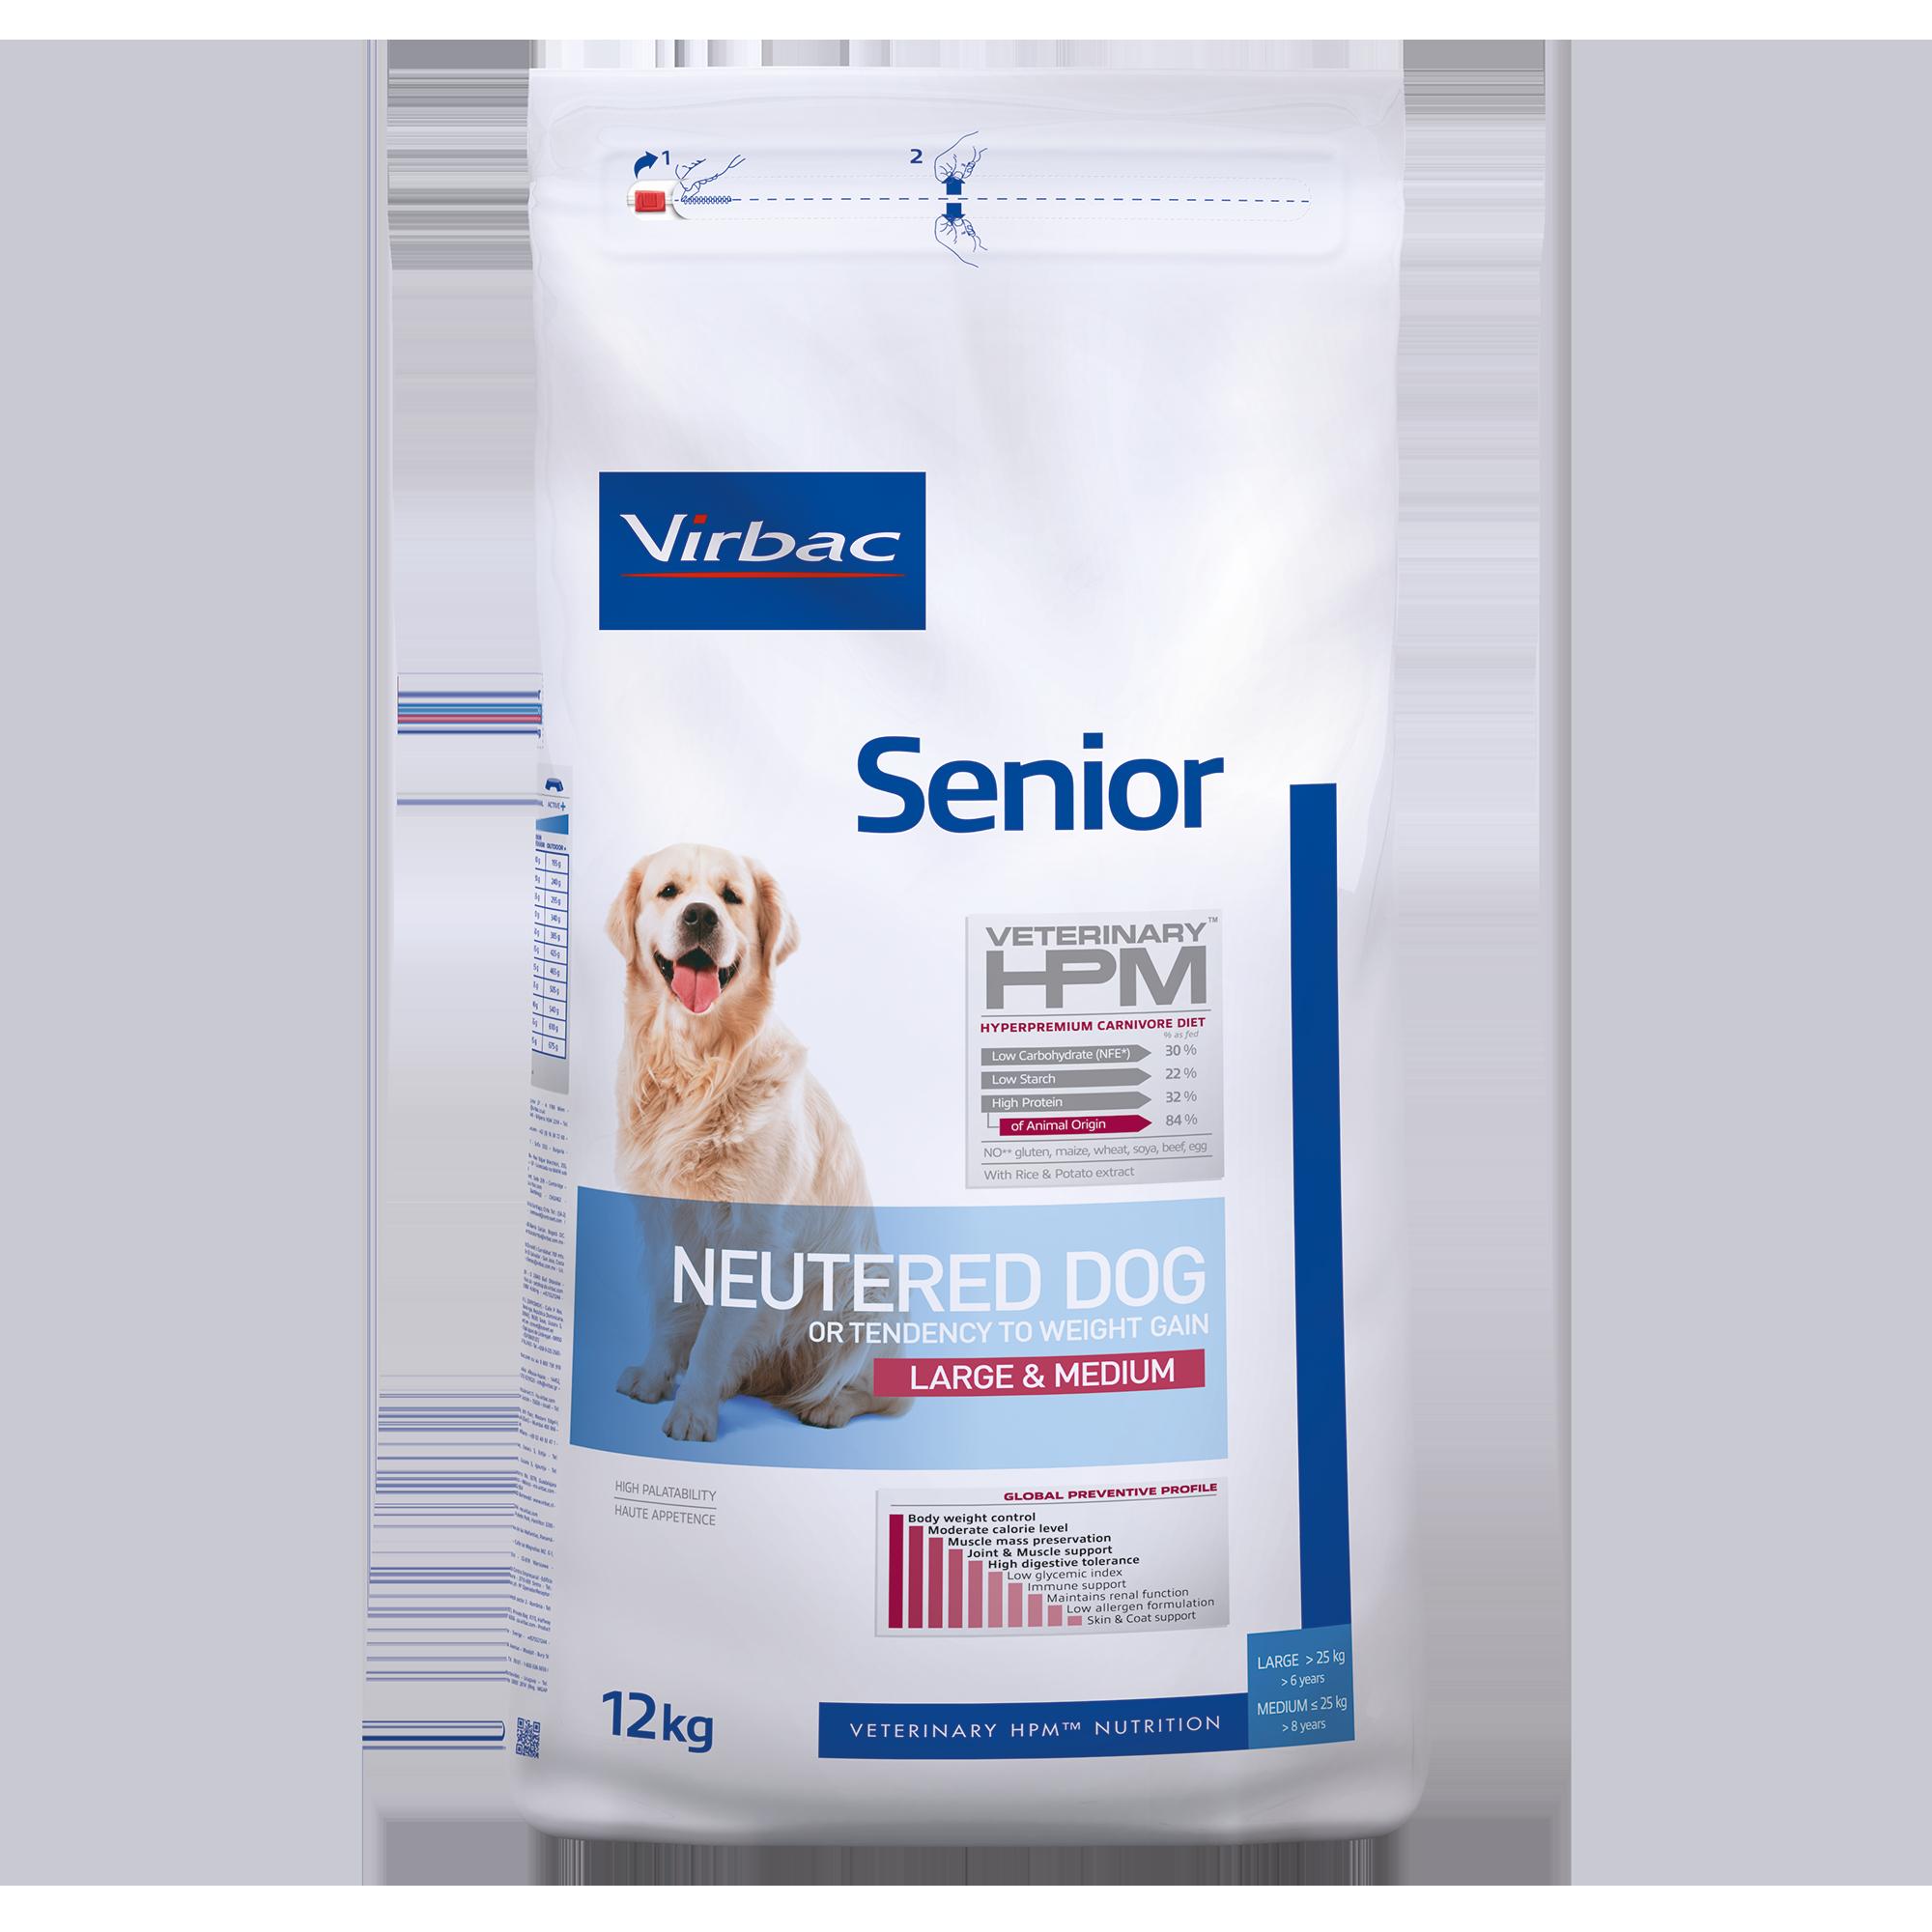 Senior Neutered Dog Large & Medium - 12 kg